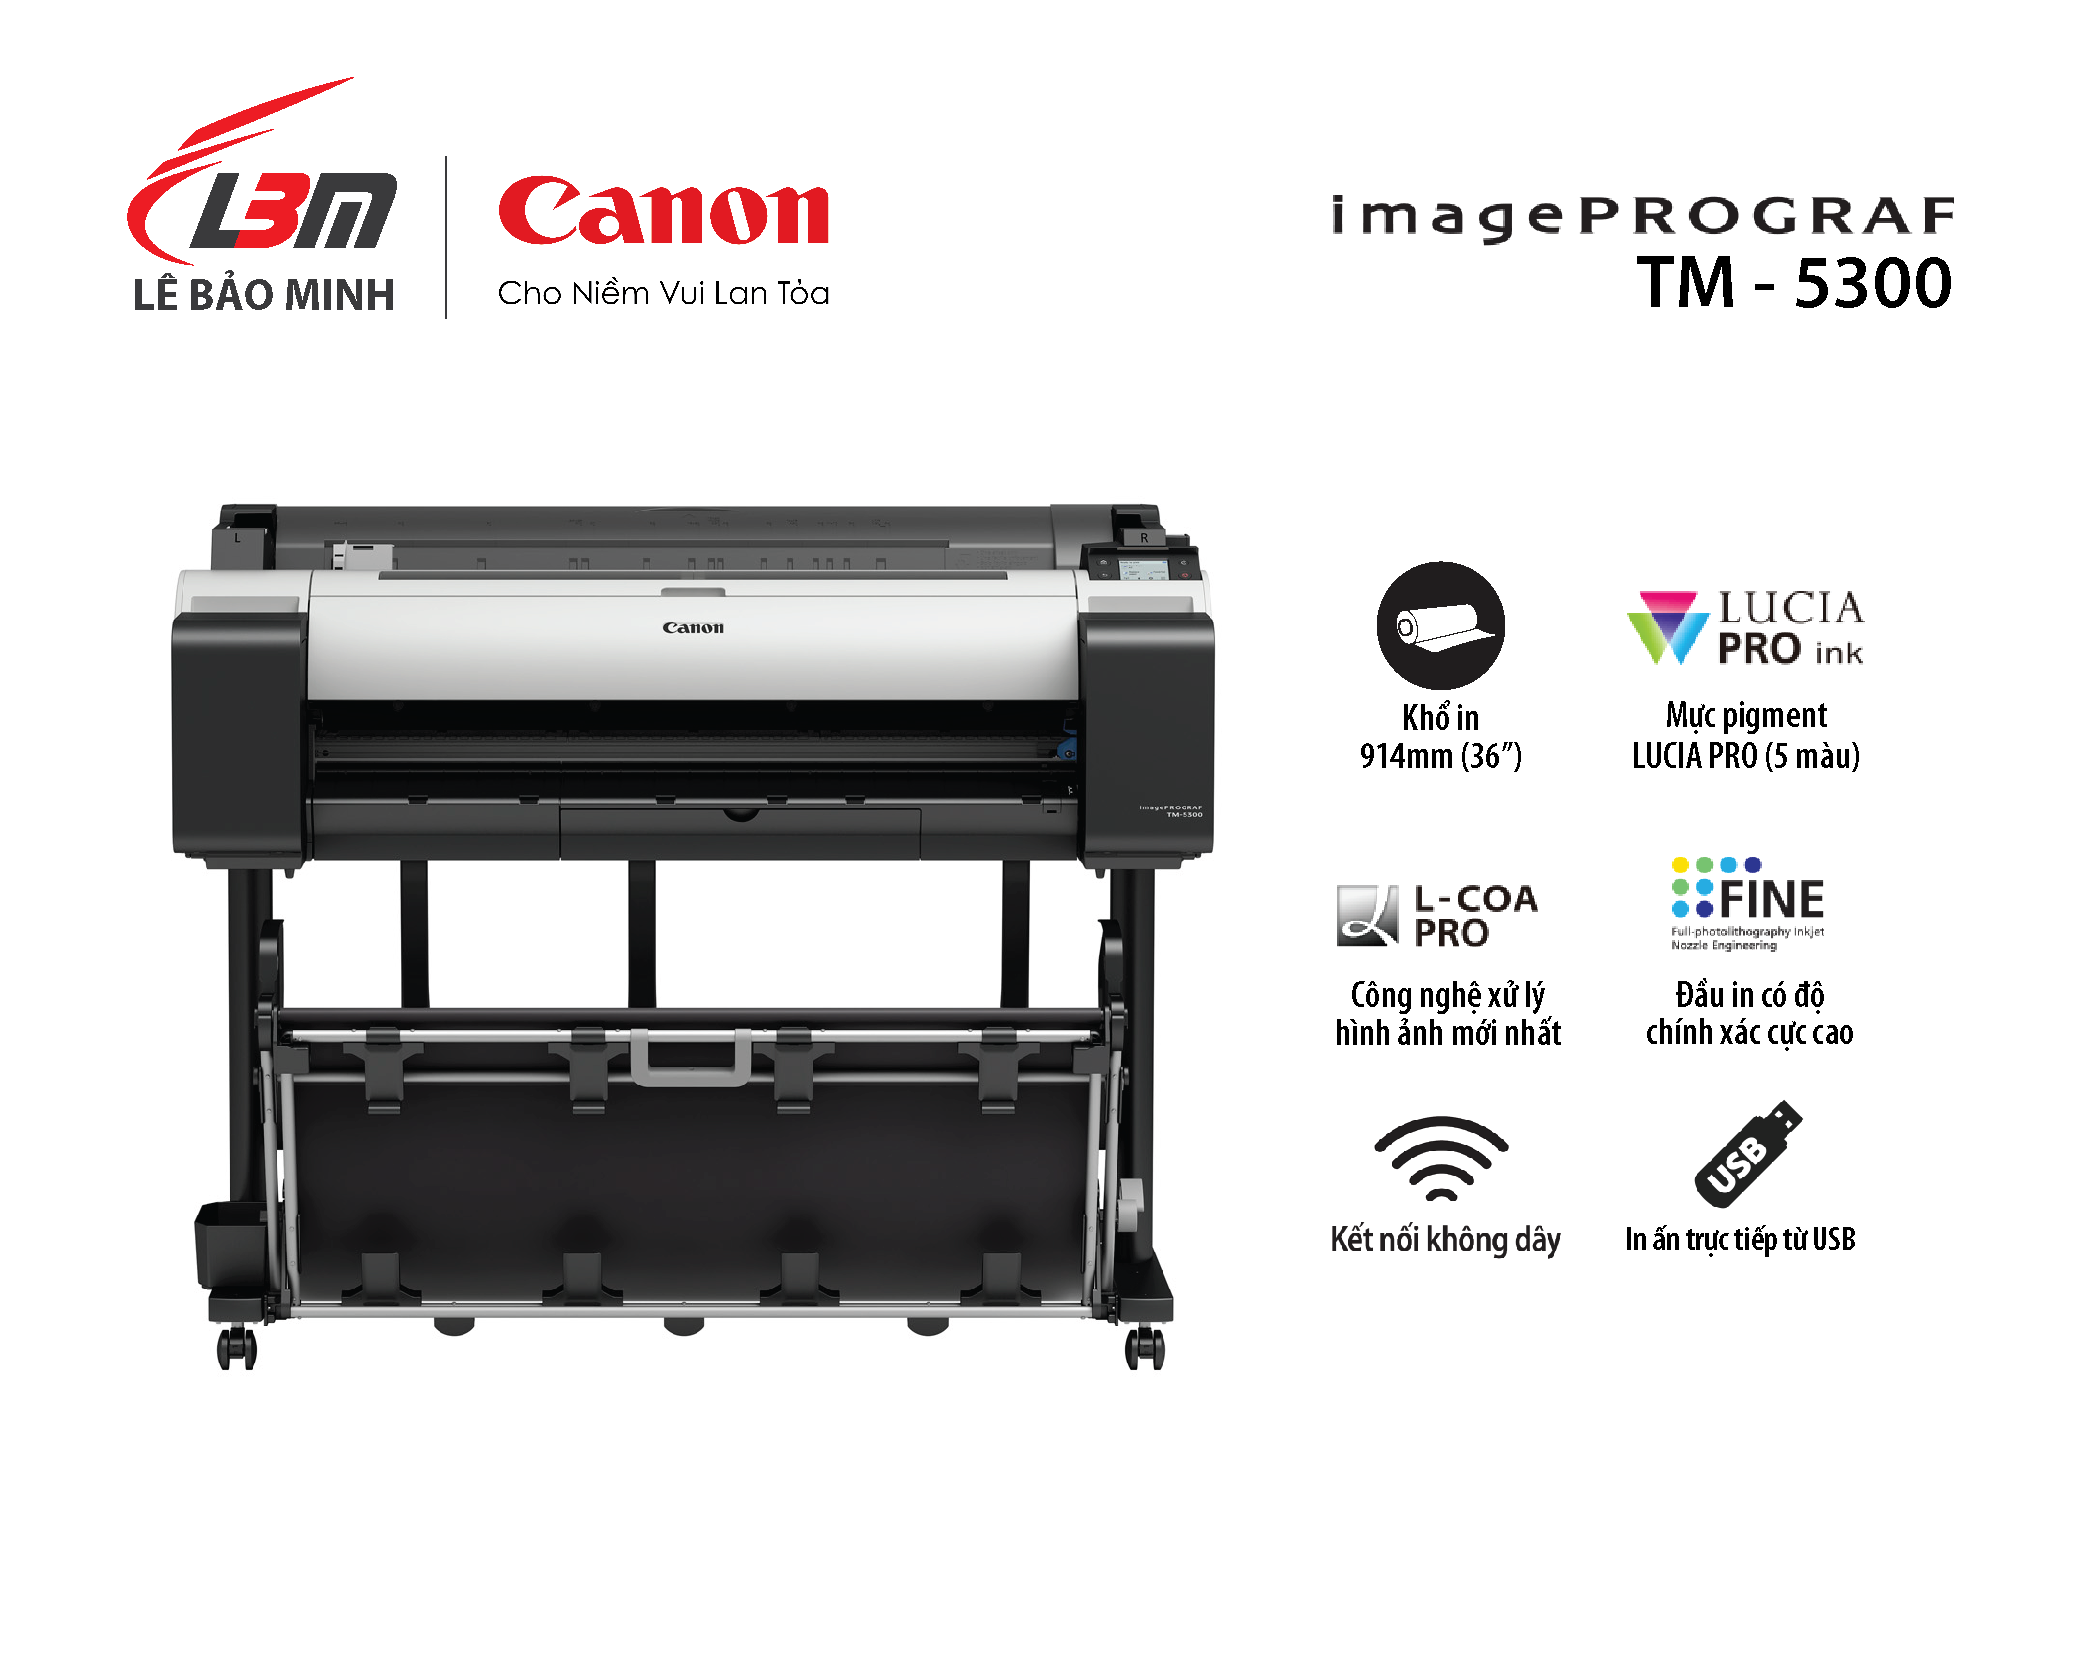 imagePROGRAF TM-5300 (5 màu mực)